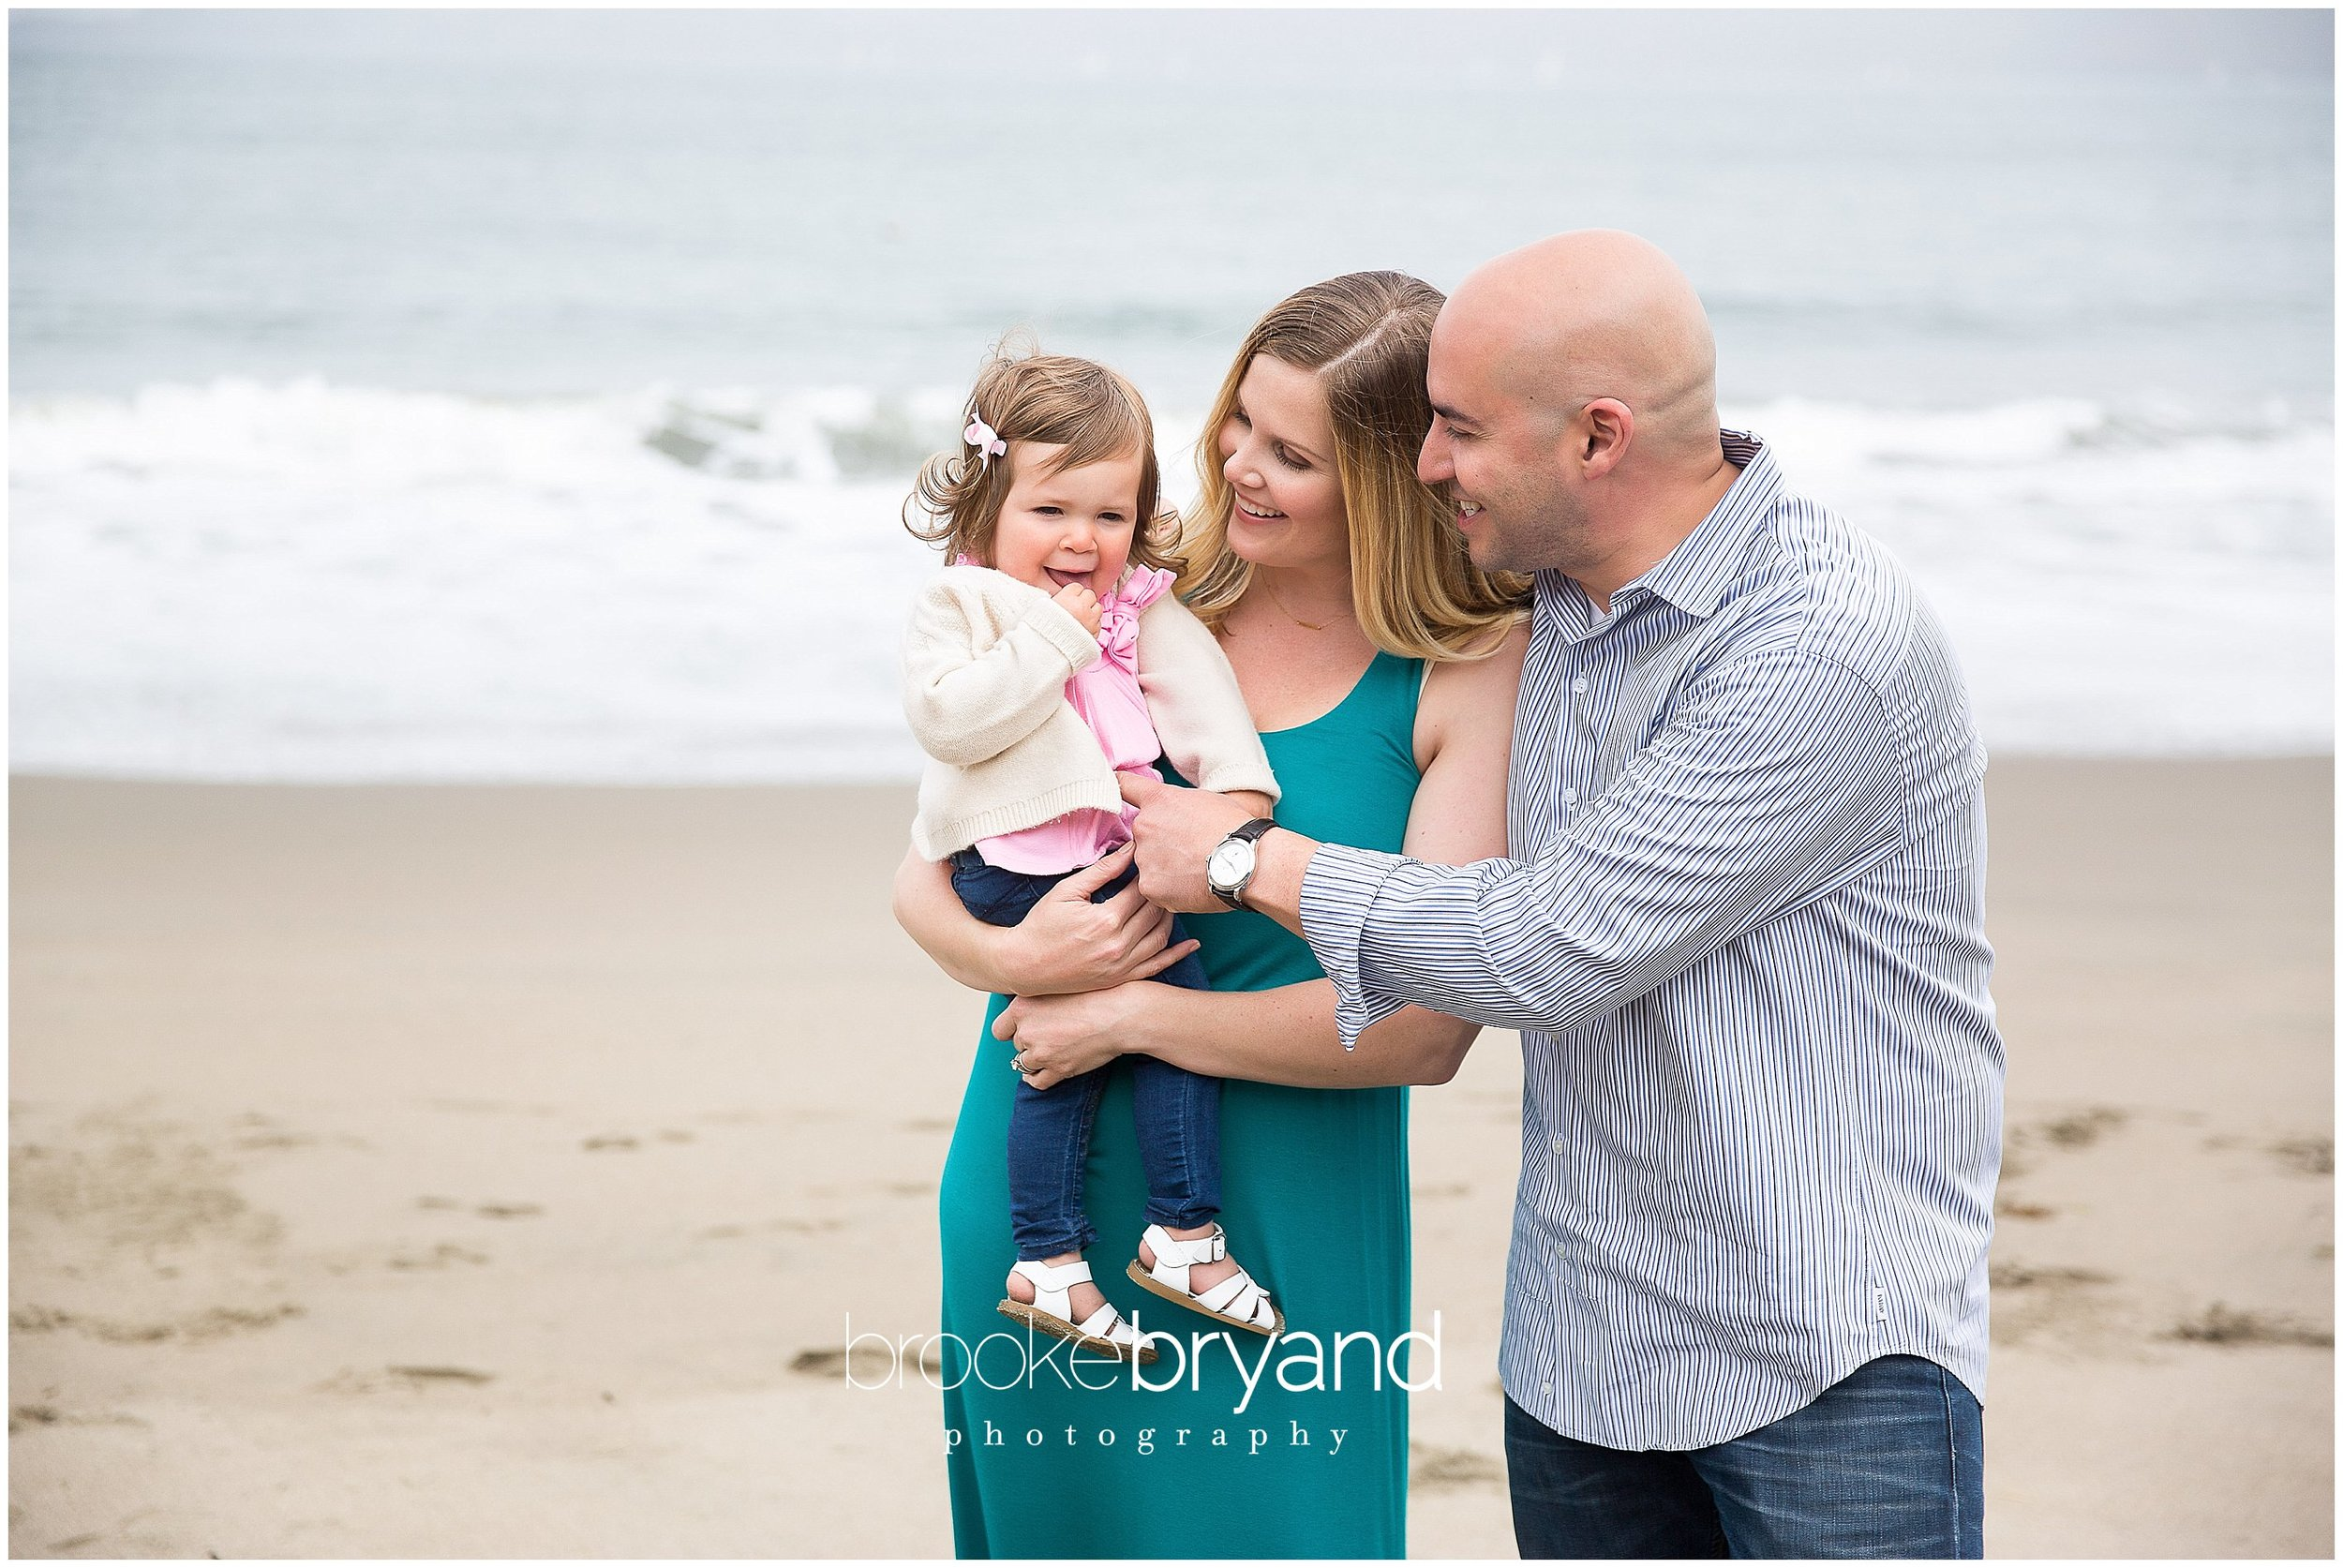 05.2014-Tamer-BBP_6672-Brooke-Bryand_San-Francisco-Family-Photos-Brooke-Bryand-Photography.jpg